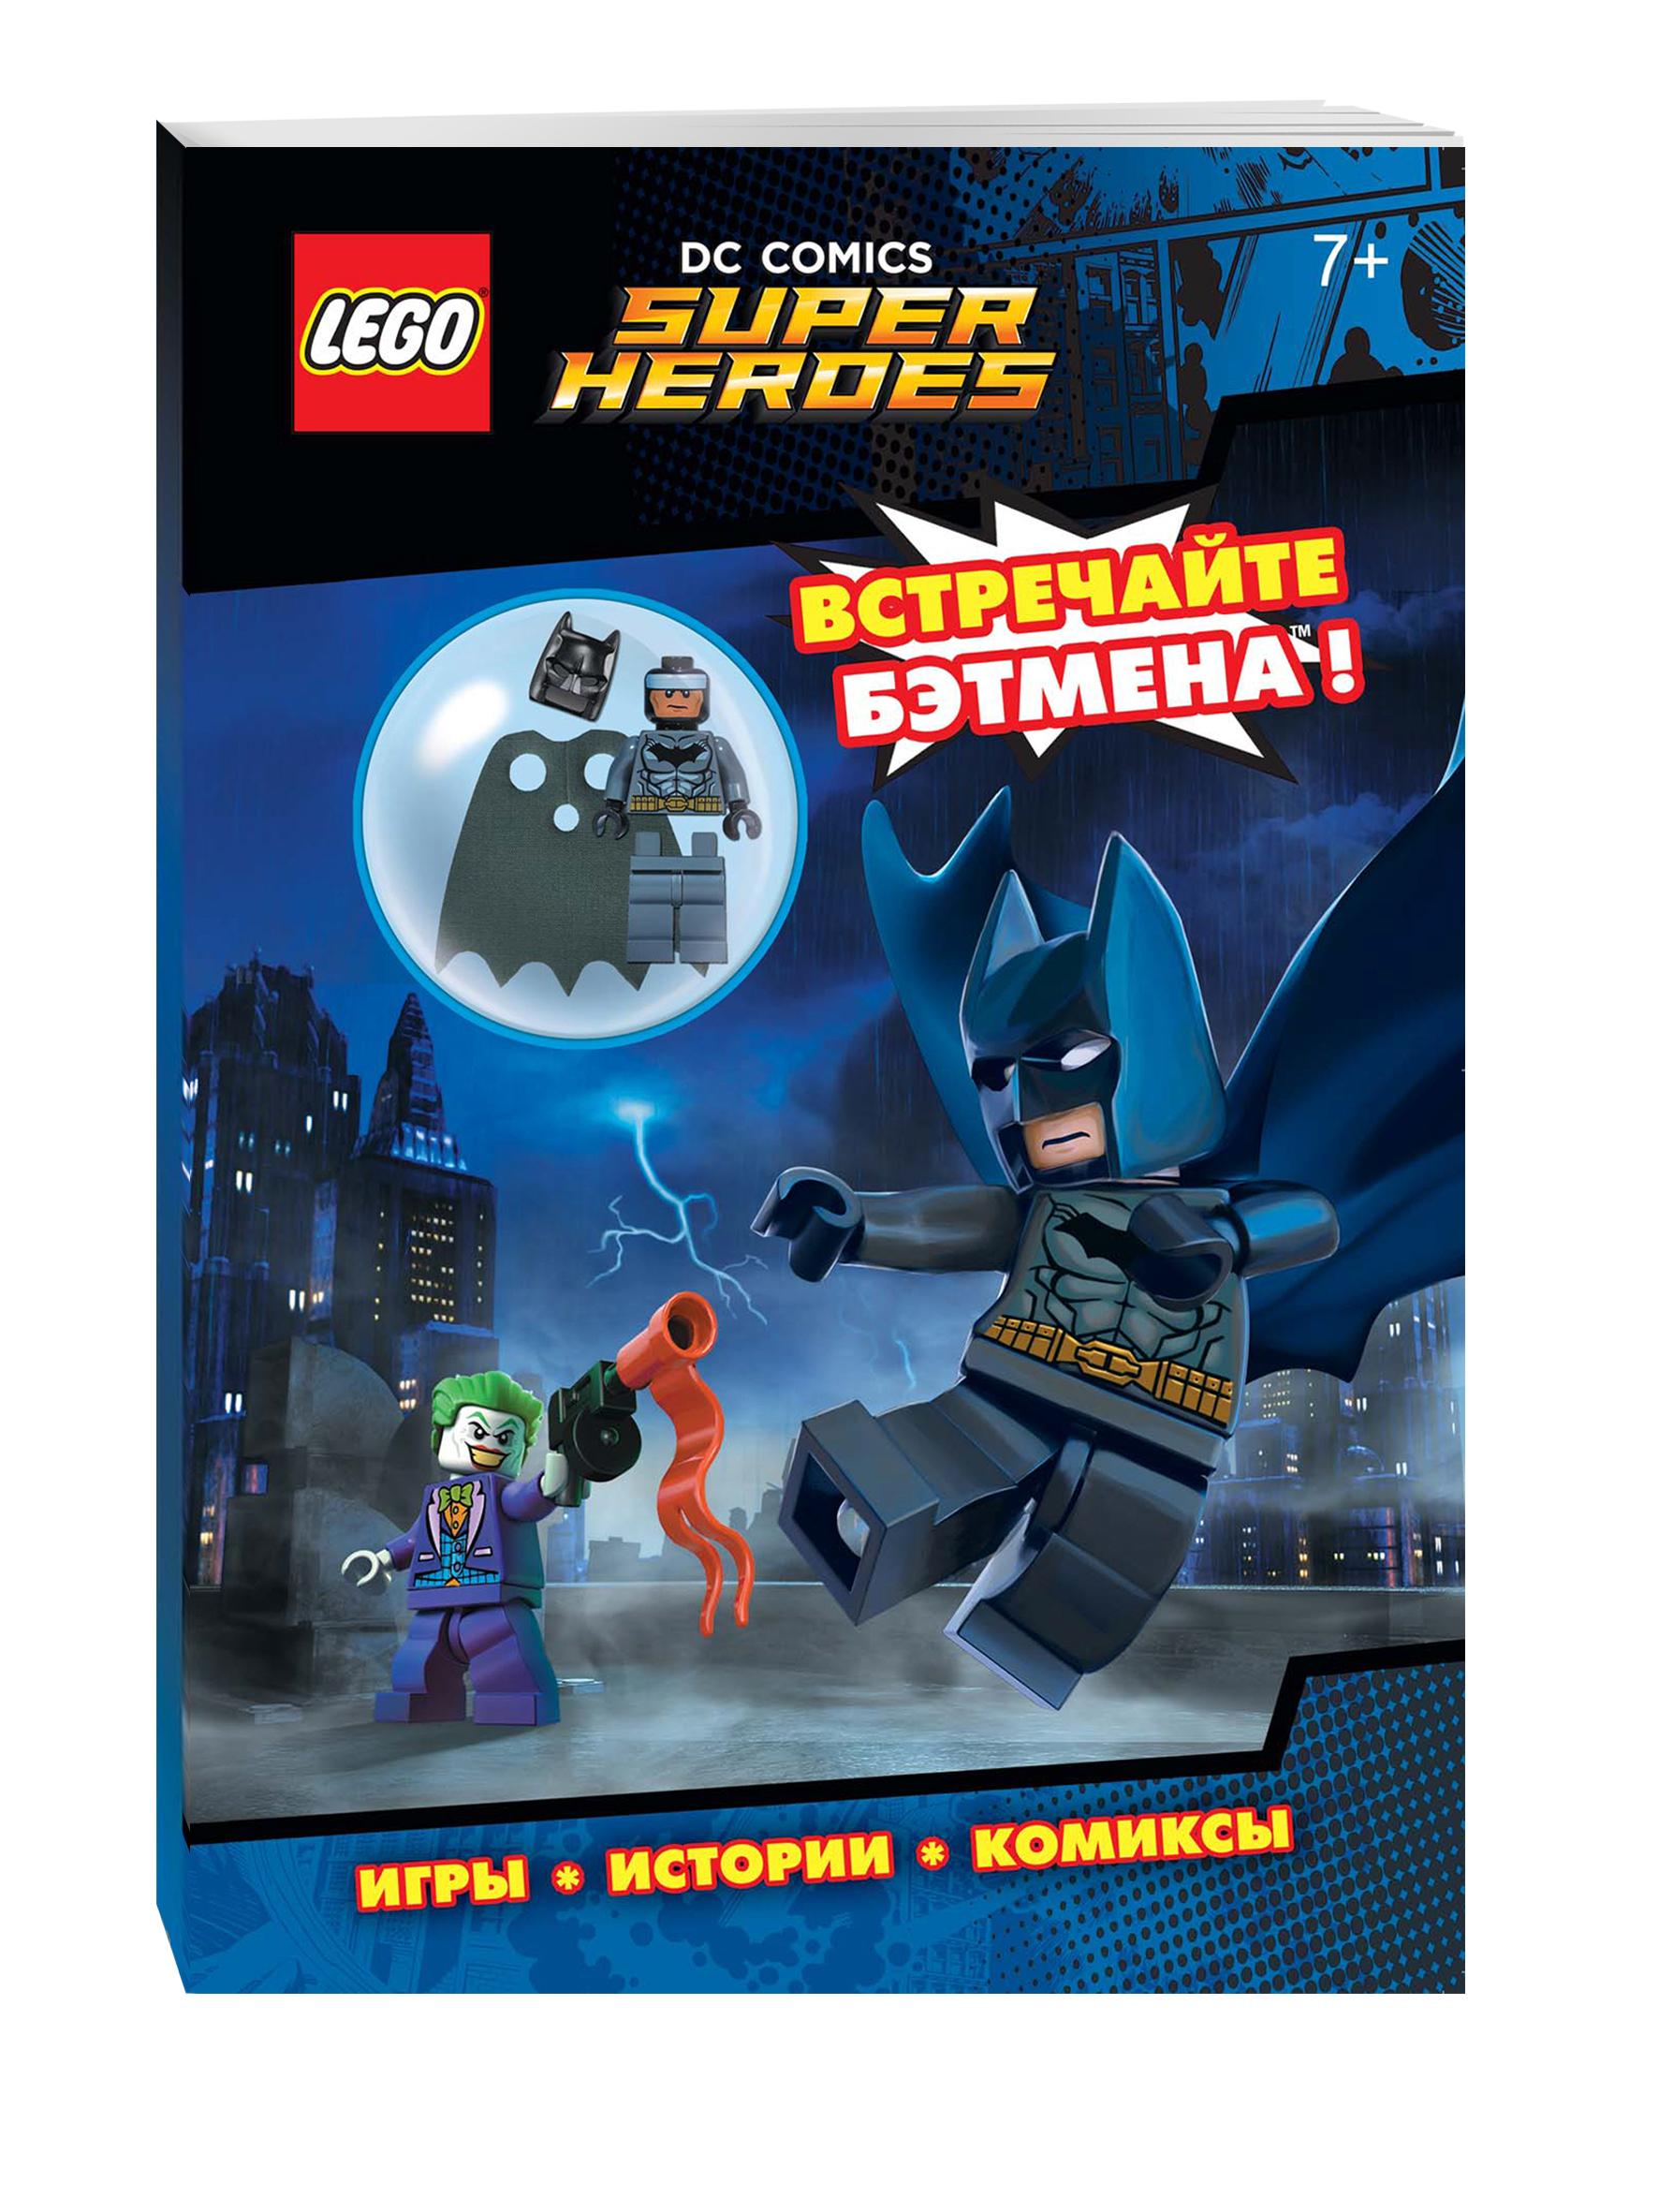 LEGO DC Comics. Встречайте Бэтмена! (со сборной мини-фигуркой Бэтмена) givenchy le de givenchy